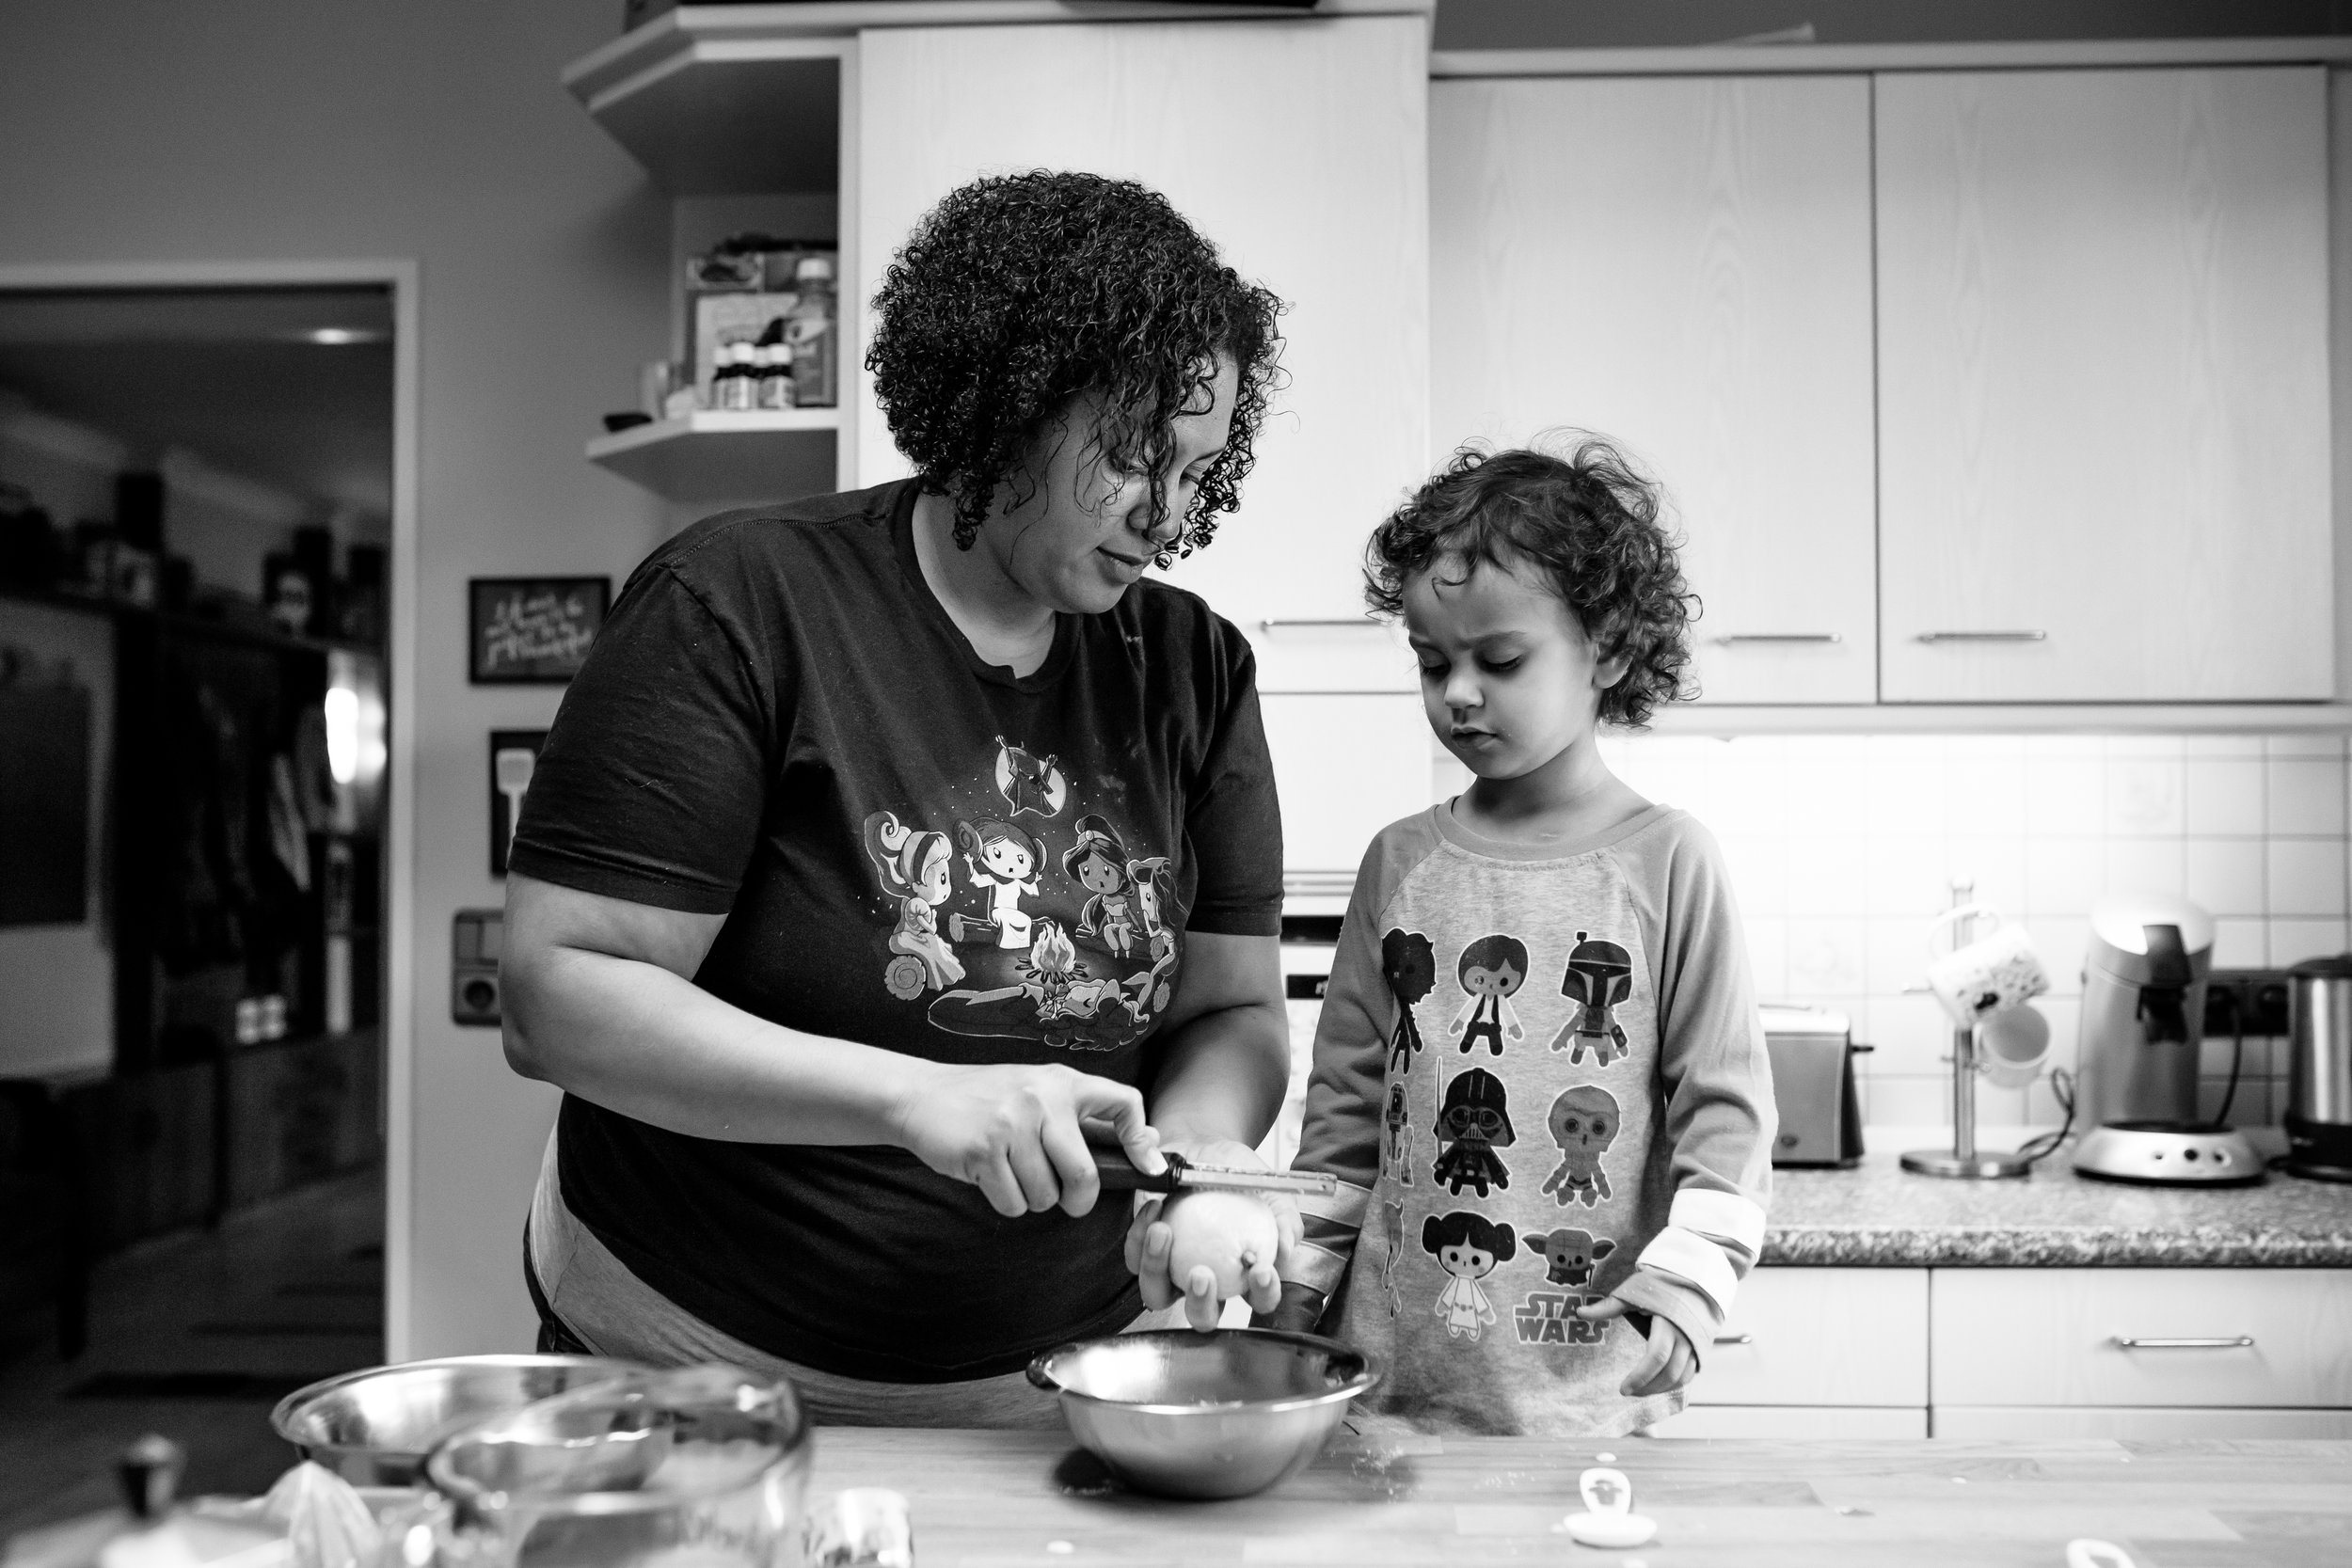 Mom shows daughter how to grate lemon peel